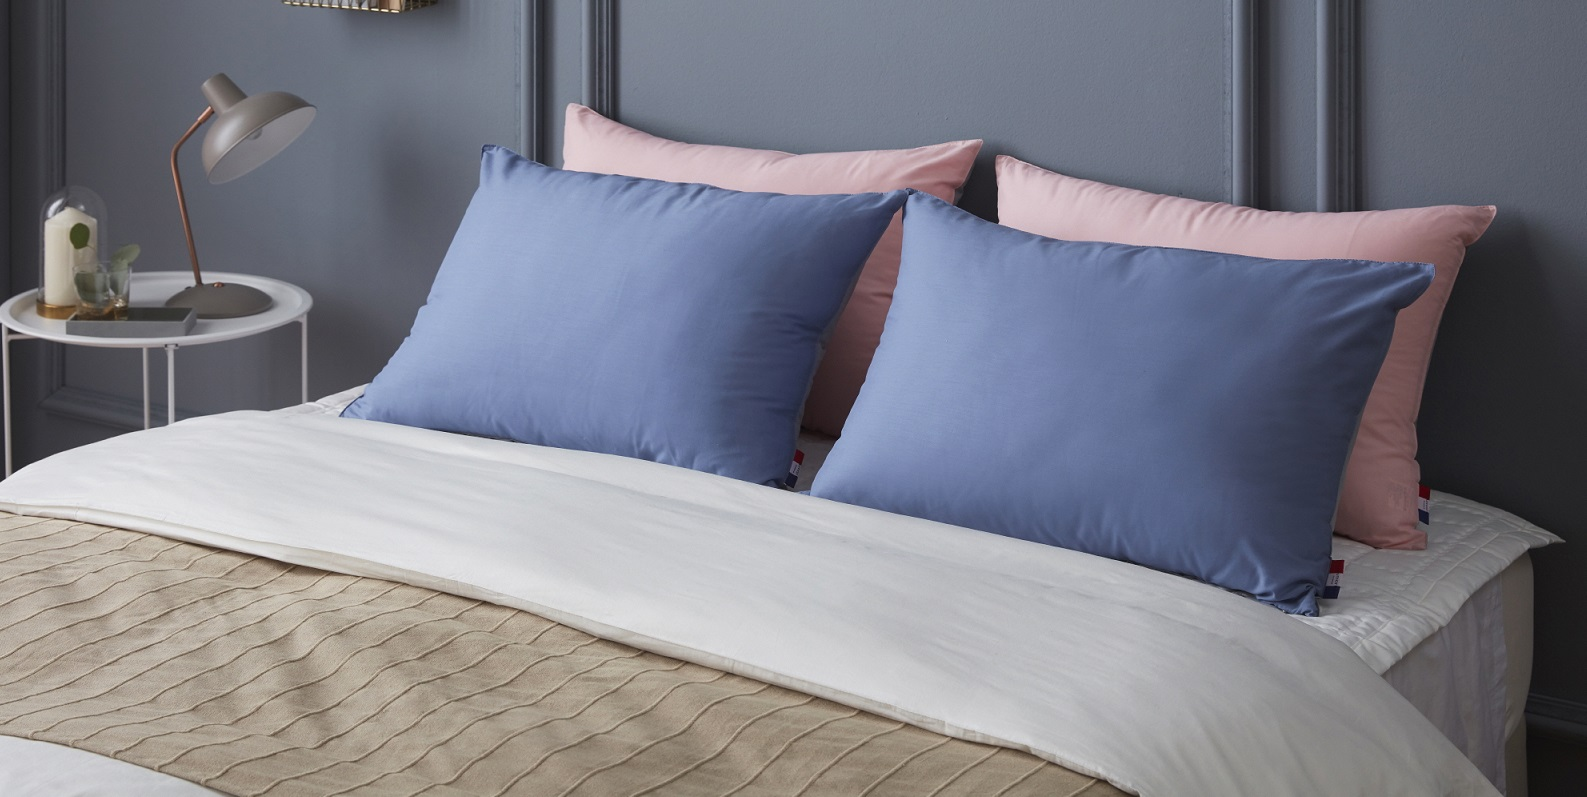 NARA's Anti-Allergy Bedding